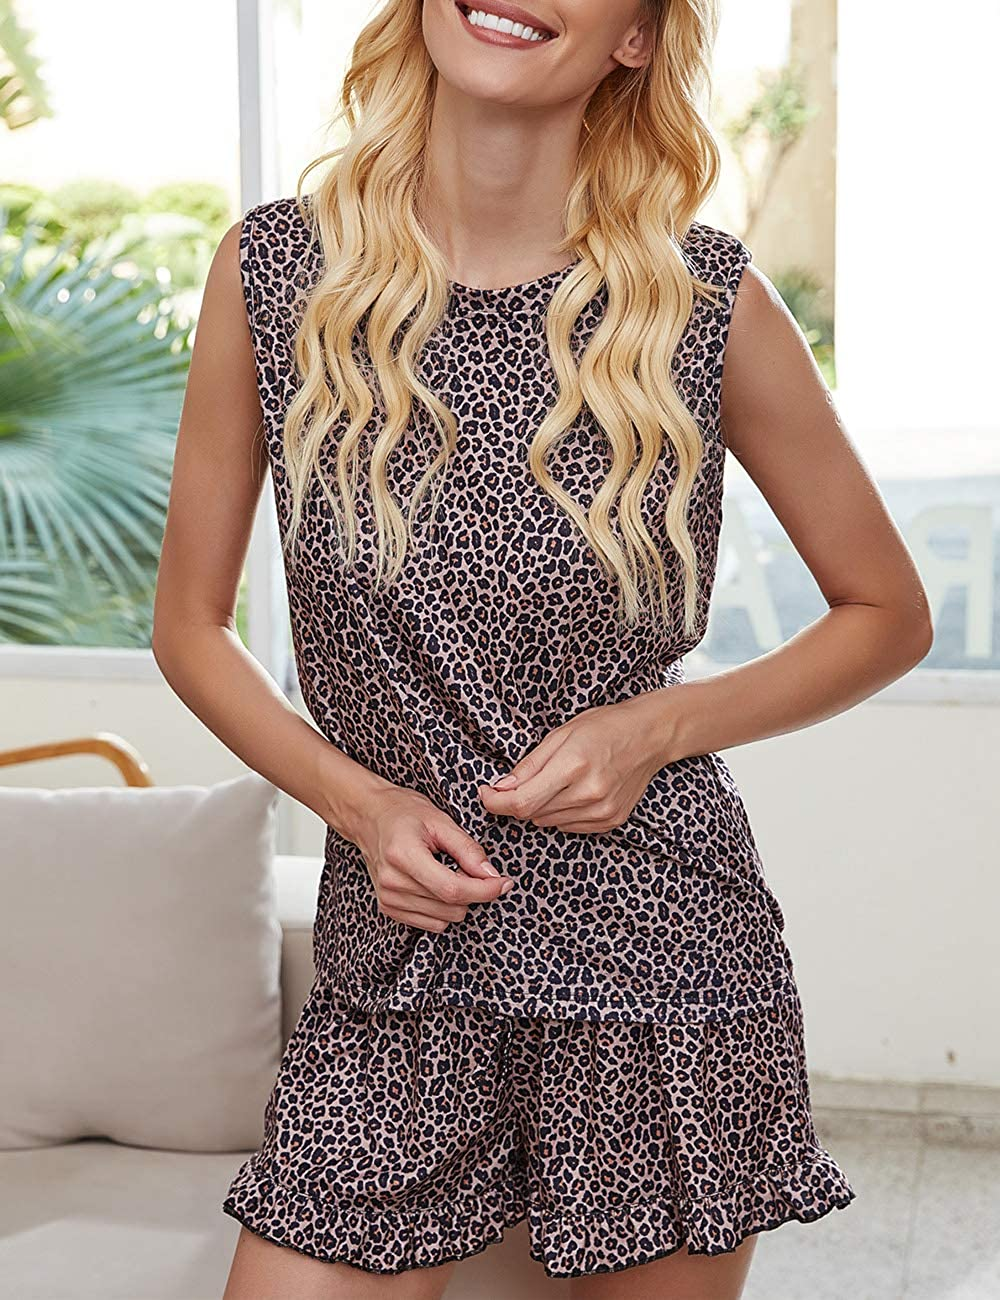 Fanuerg Womens Tie Dye Print Tee and Shorts Pajama Set Sleepwear Nightwear